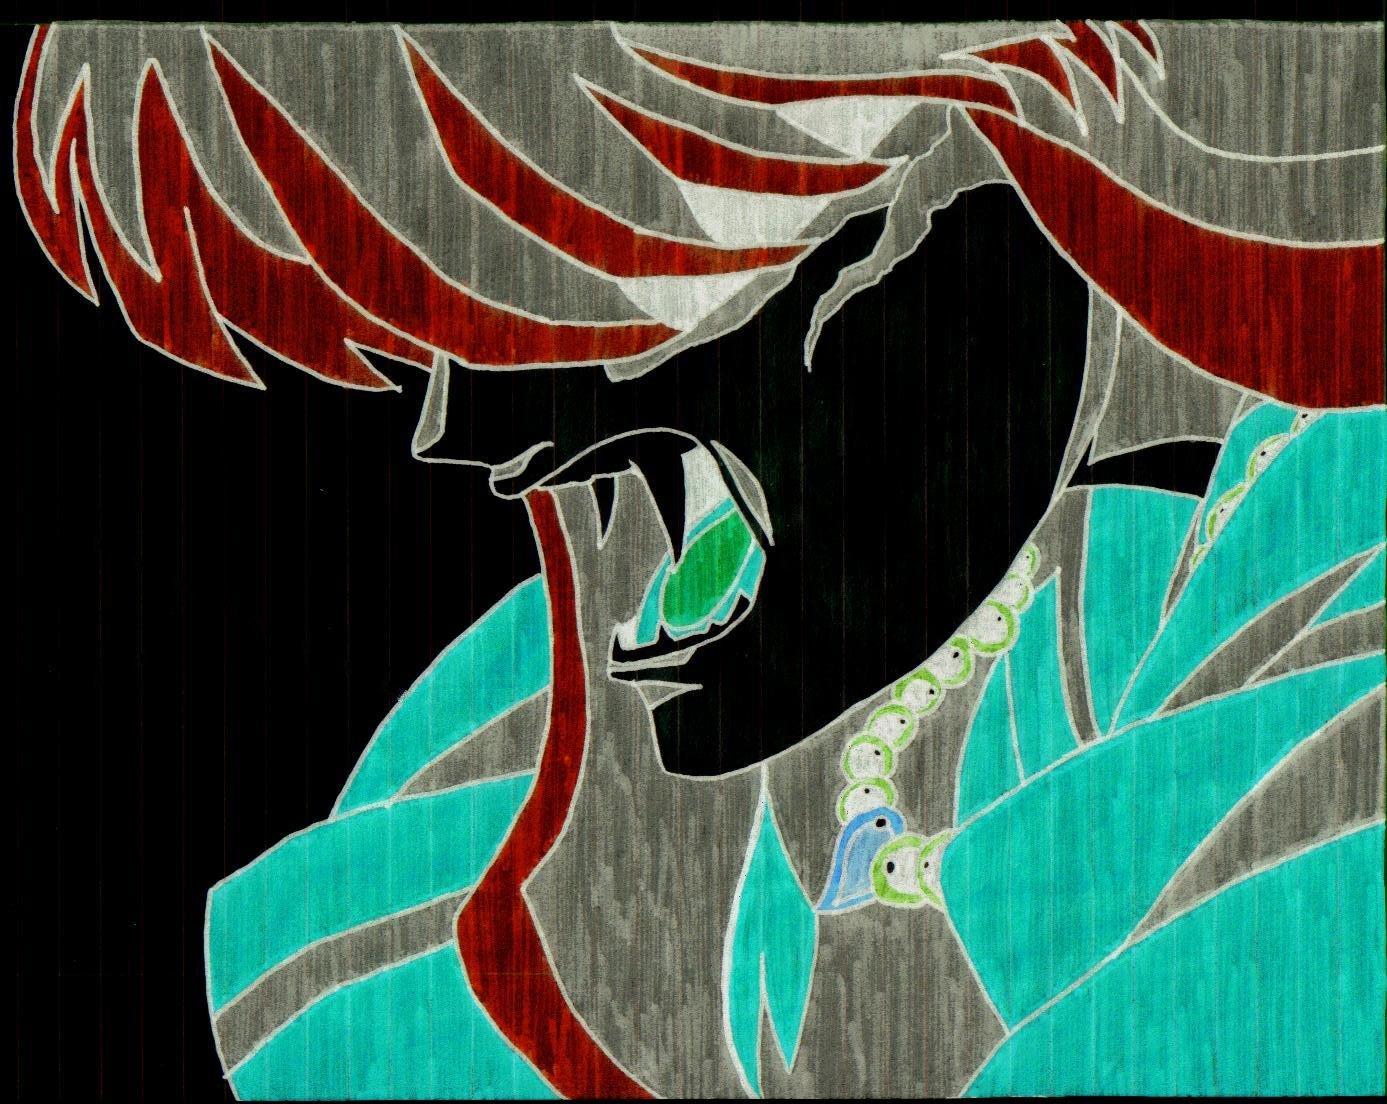 Dark rage by shipp_shippo